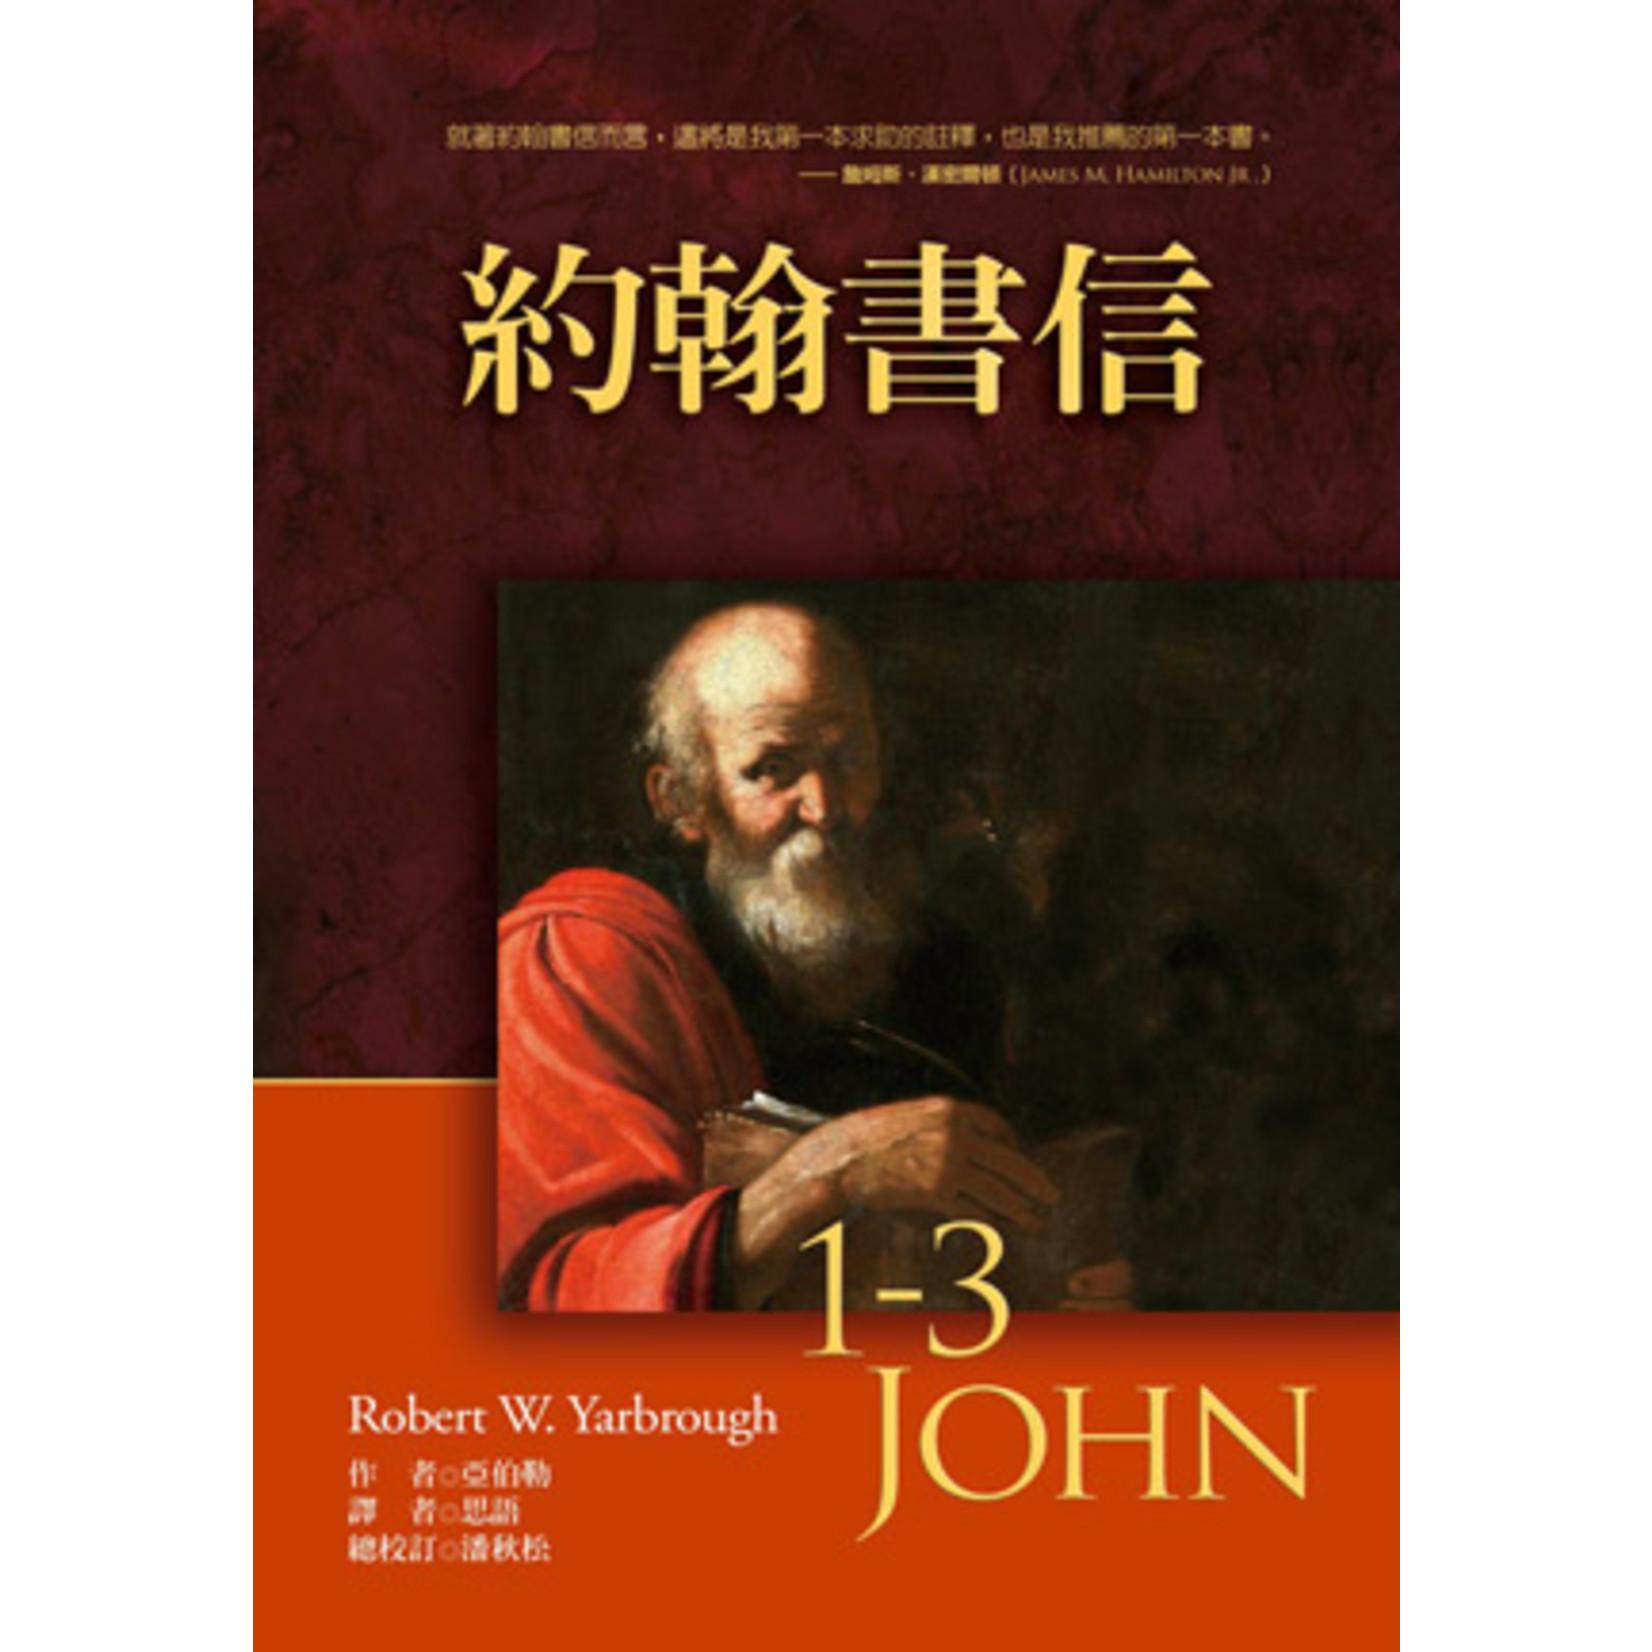 美國麥種傳道會 AKOWCM 麥種聖經註釋:約翰書信 1-3 John (Baker Exegetical Commentary on the New Testament)